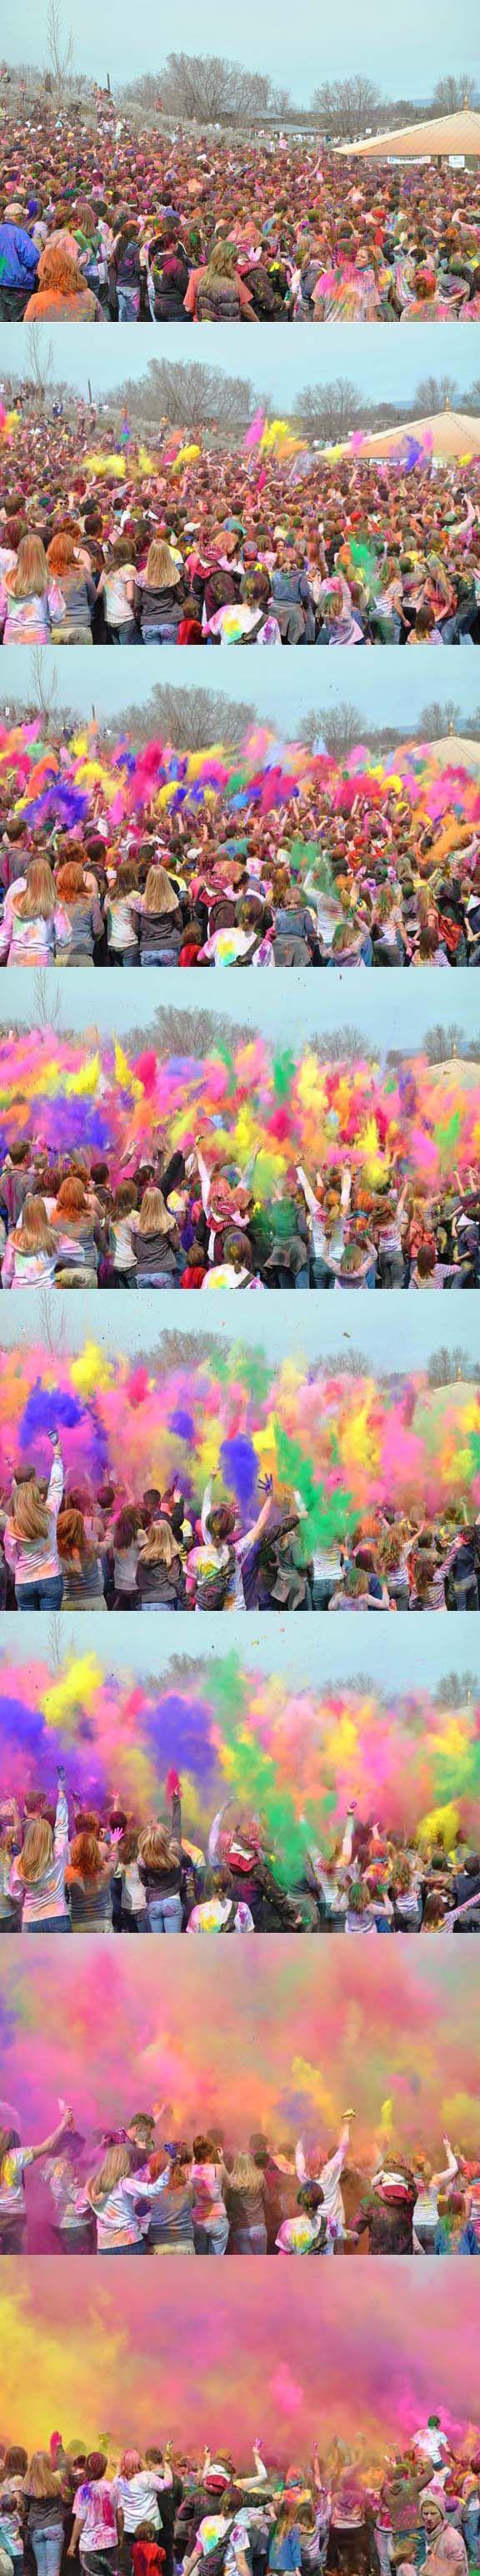 festival-of-colors-utah: Festivals Of Colors Utah, Buckets Lists, Bright Future, Festivals Weeks, Holy Festivals, Festivales Of Colors Utah, Beautiful Utah, Utah Festivals, Carnivals Festivals Worldwide